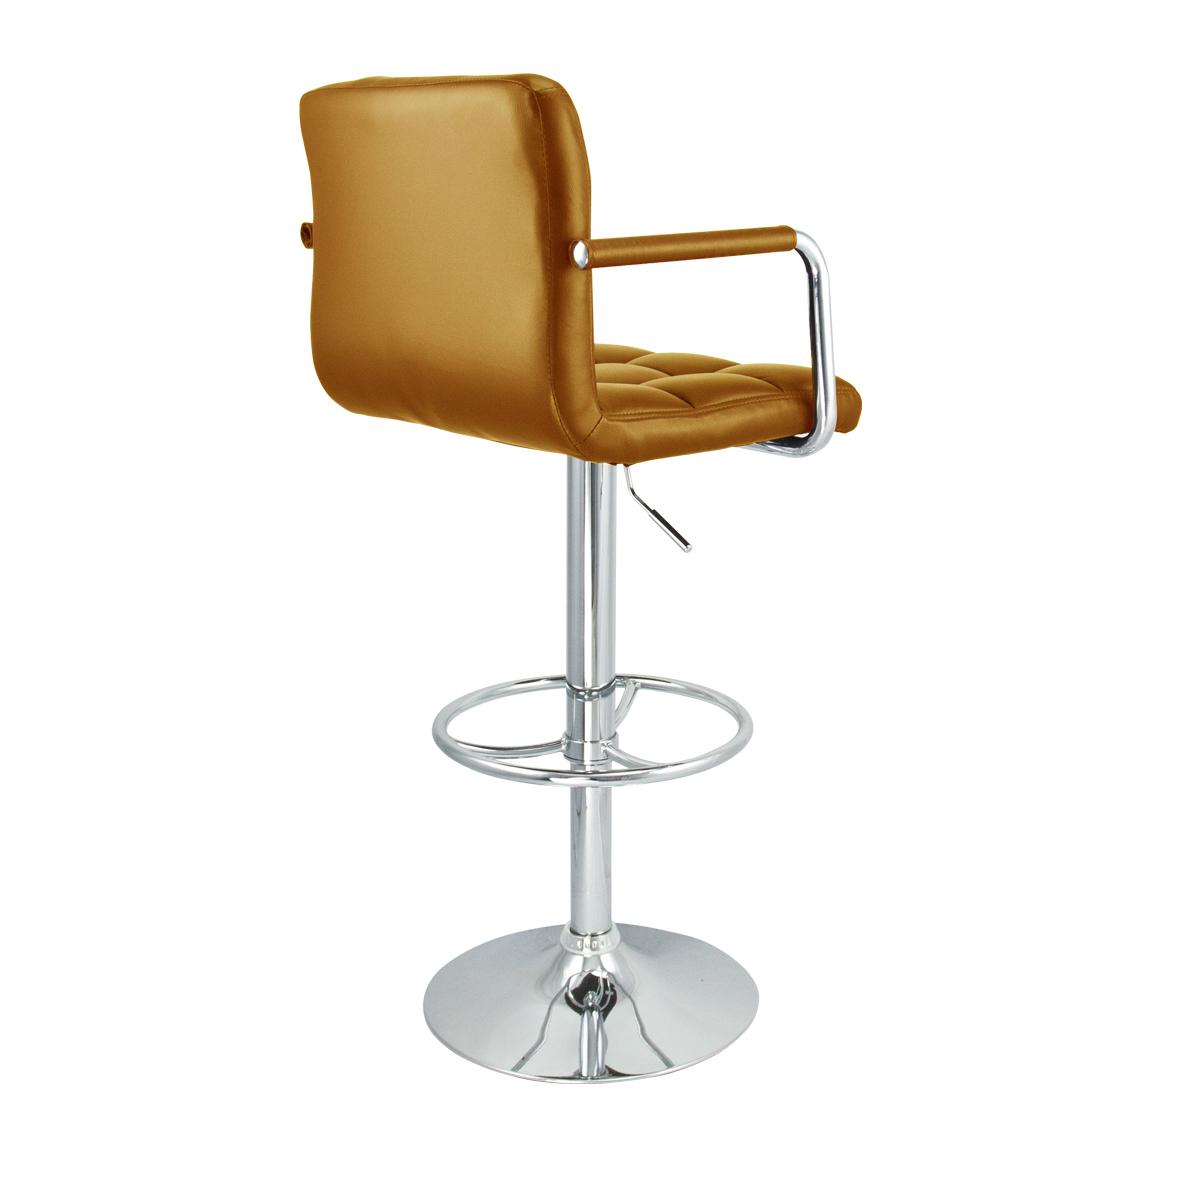 stool chair adjustable step 4 mocha arm swivel bar leather modern